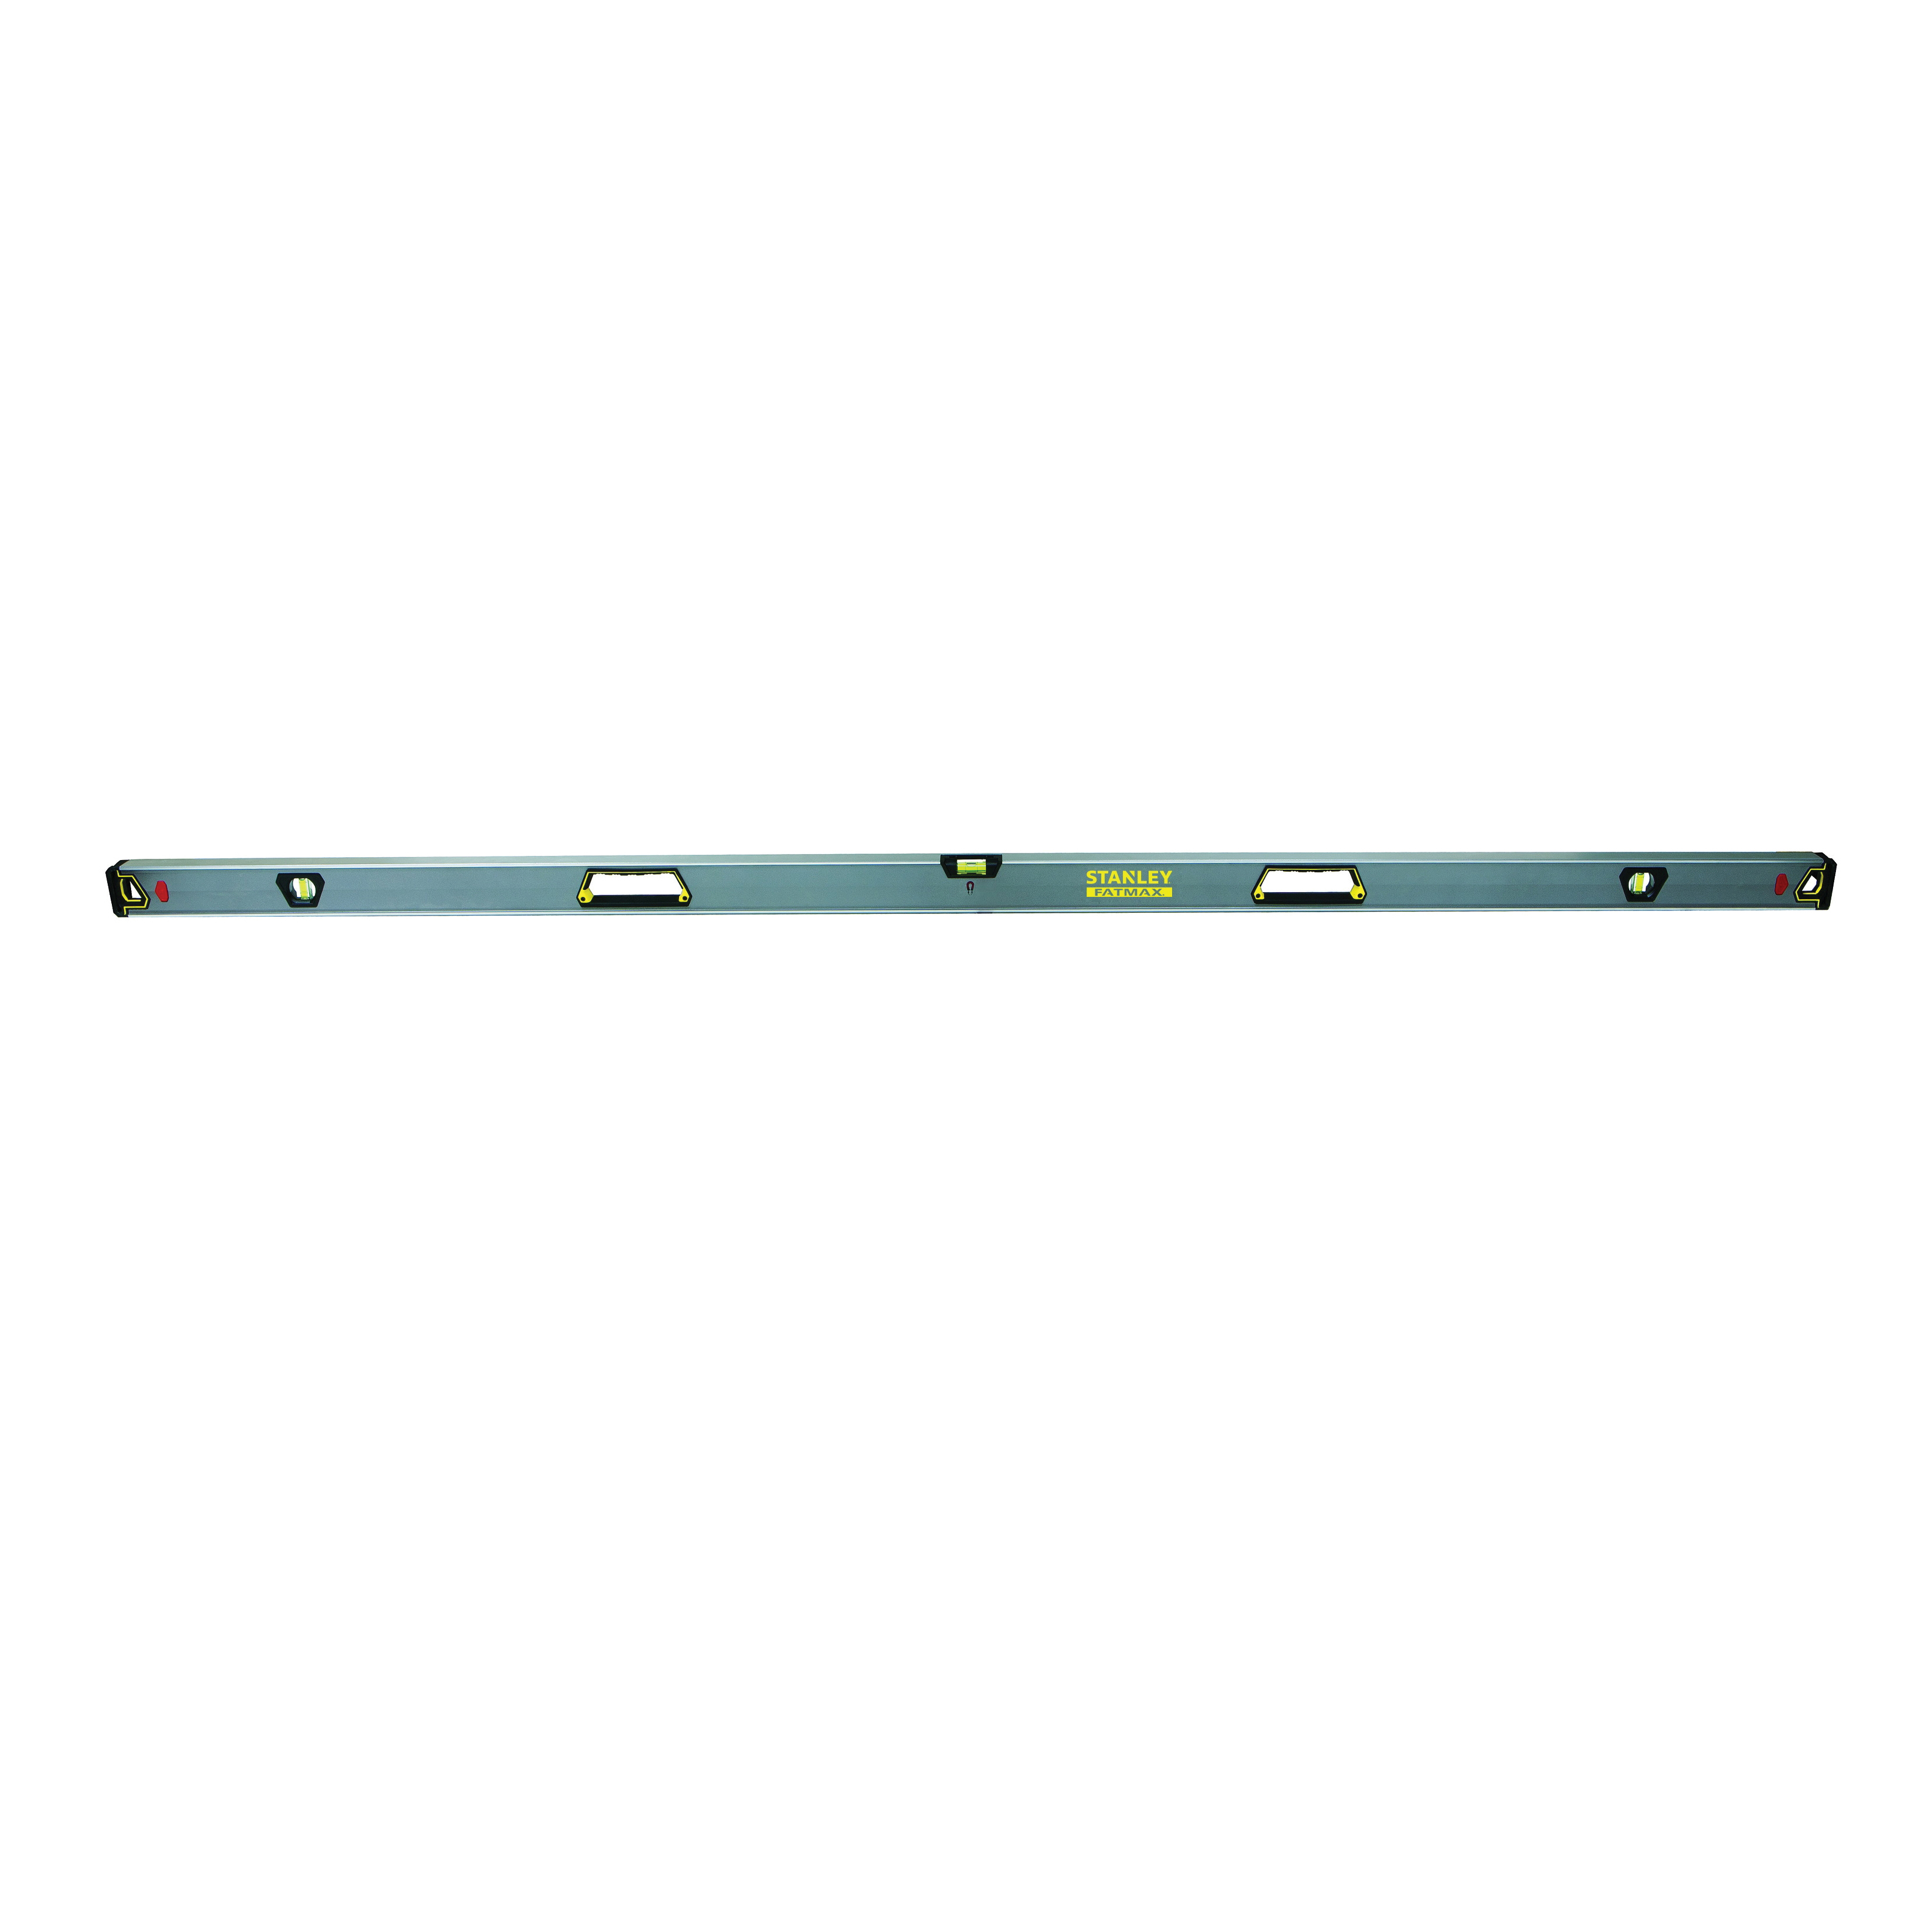 Stanley® FatMax® FMHT42407 Magnetic Premium Box Beam Level, 78 in L, 3 Vials, (1) Level/(2) Plumb Vial Position, 0.0005 in, Aluminum